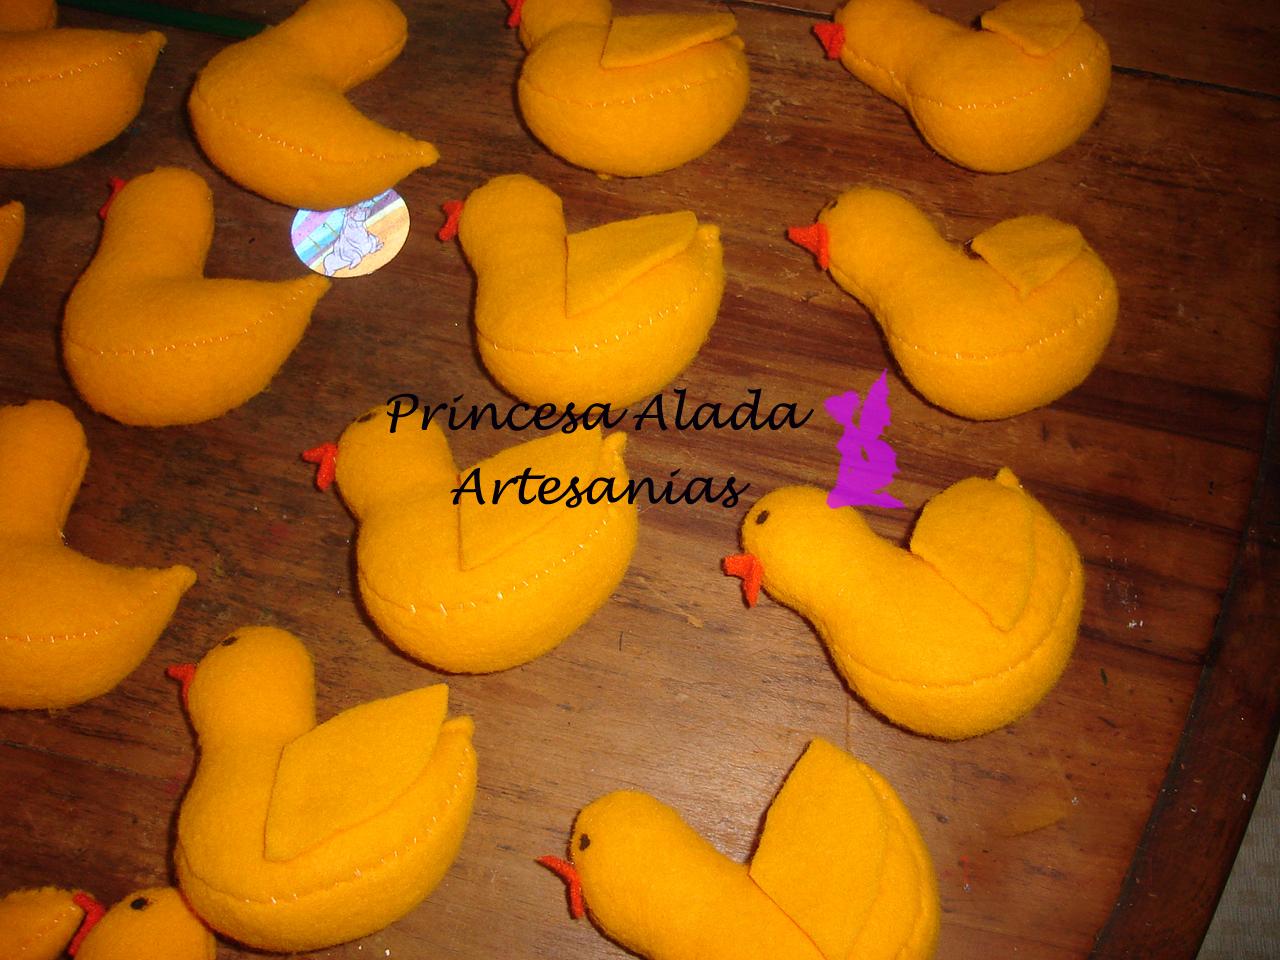 Set De Baño En Pano Lenci:Princesa Alada Artesanias: enero 2013